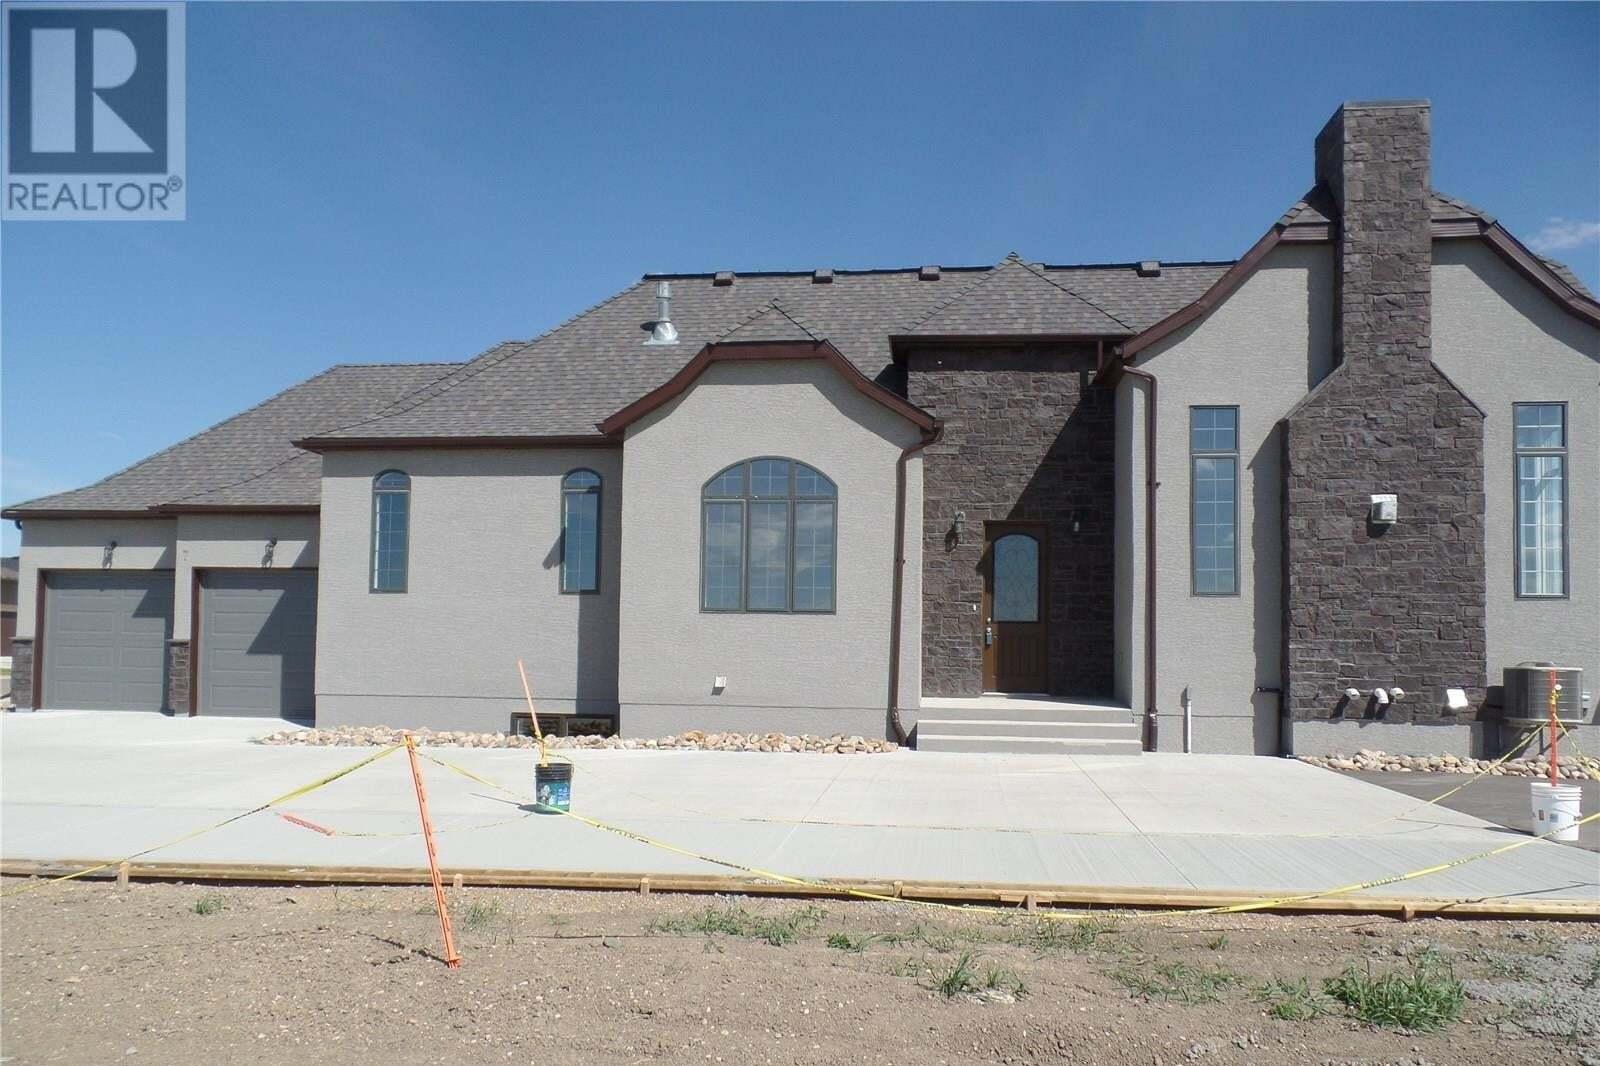 Townhouse for sale at 37 Hodges Cres Unit 7 Moose Jaw Saskatchewan - MLS: SK826014